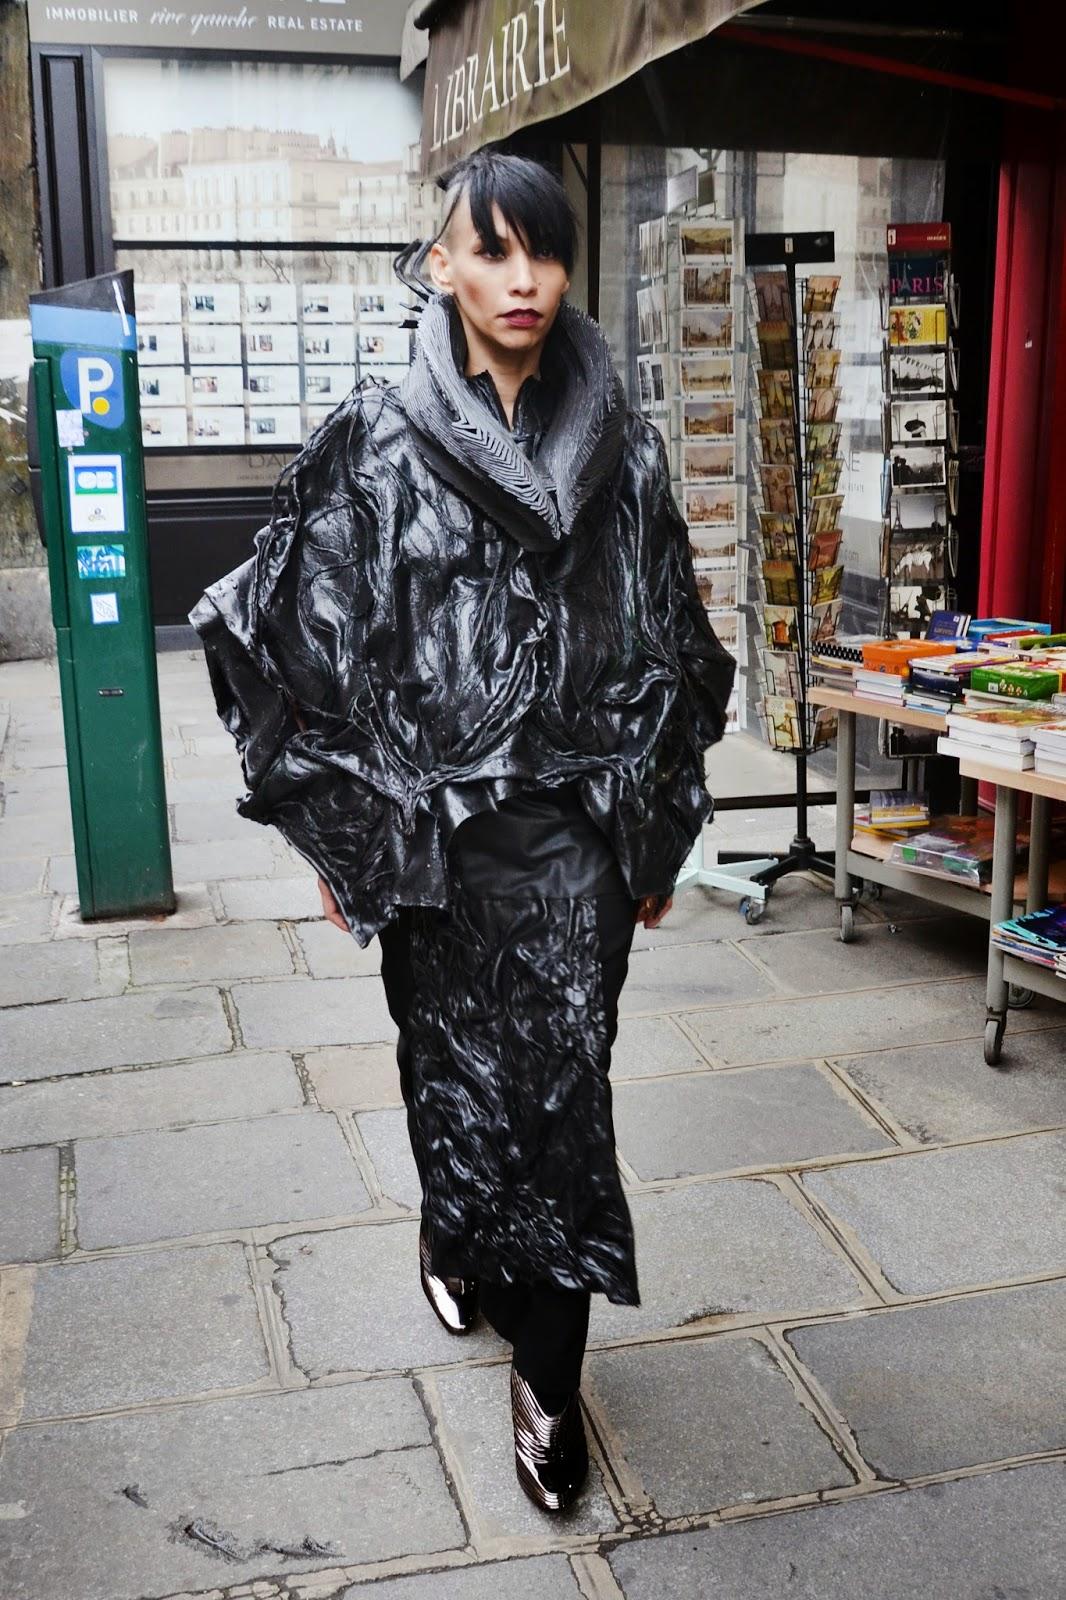 jorge ayala lily gatins paris fashion week zaha hadid shoes (4).JPG